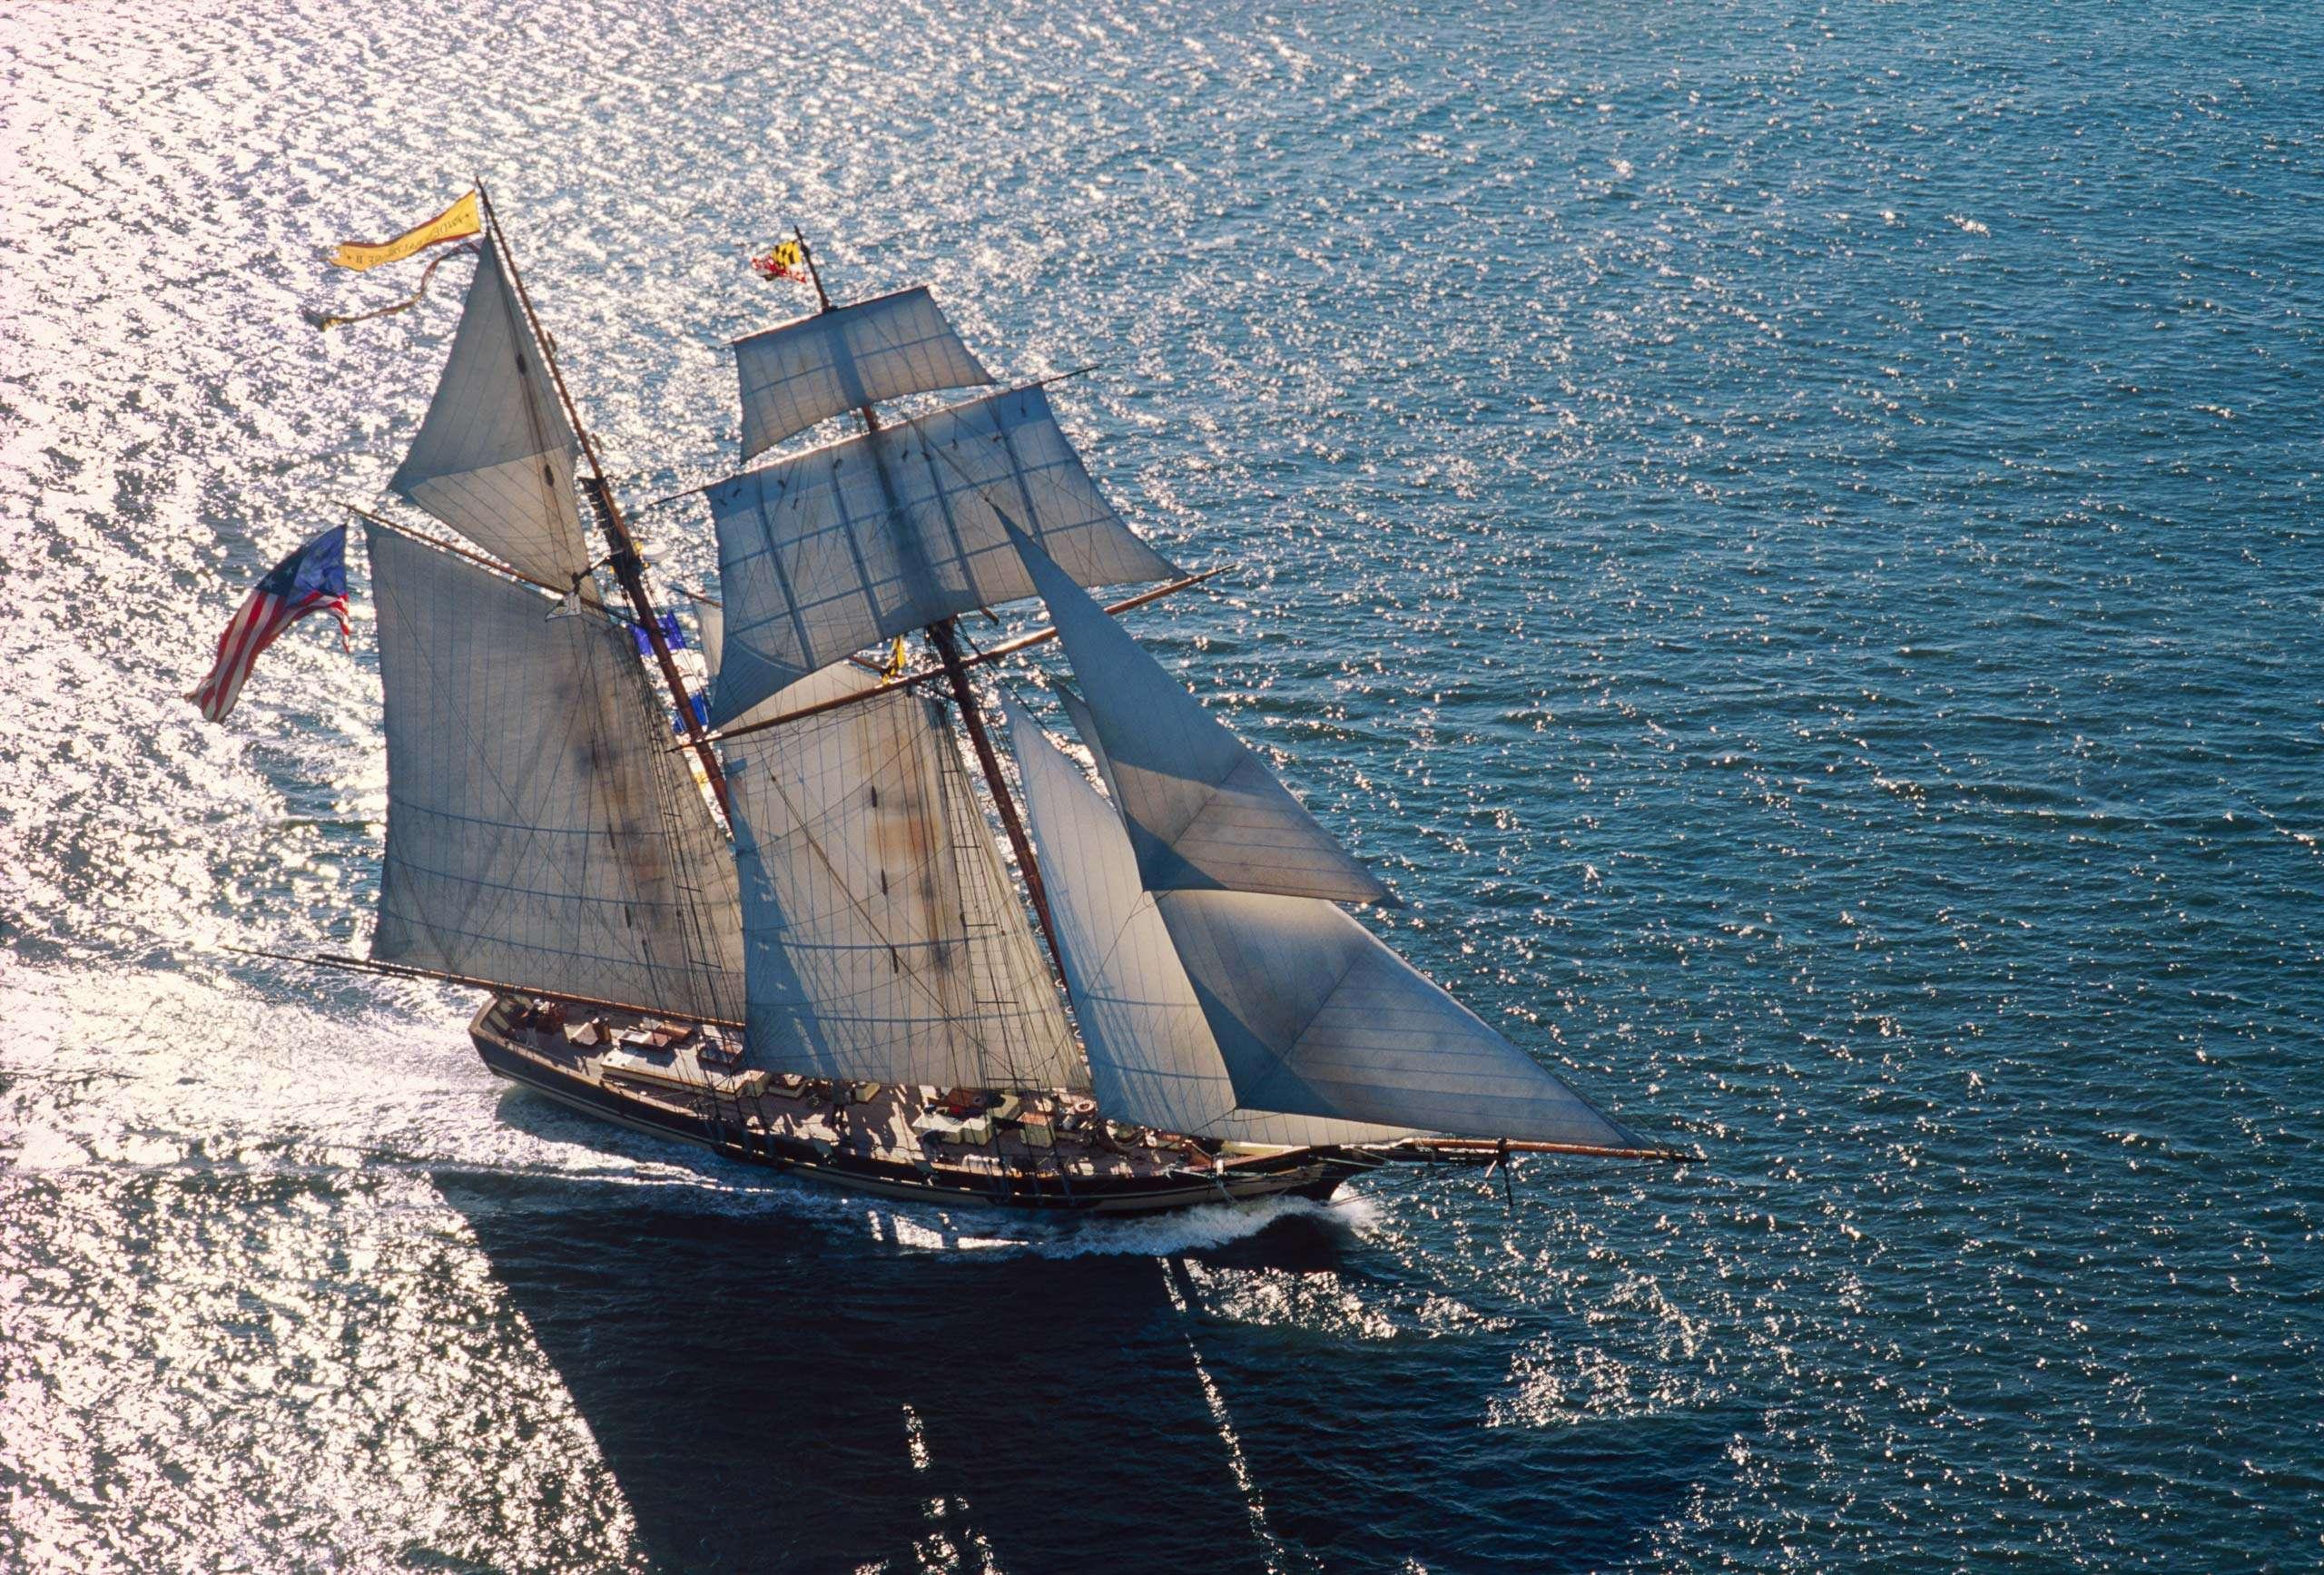 PORTFOLIO - Sailing - Tall Ships #16-PCG135